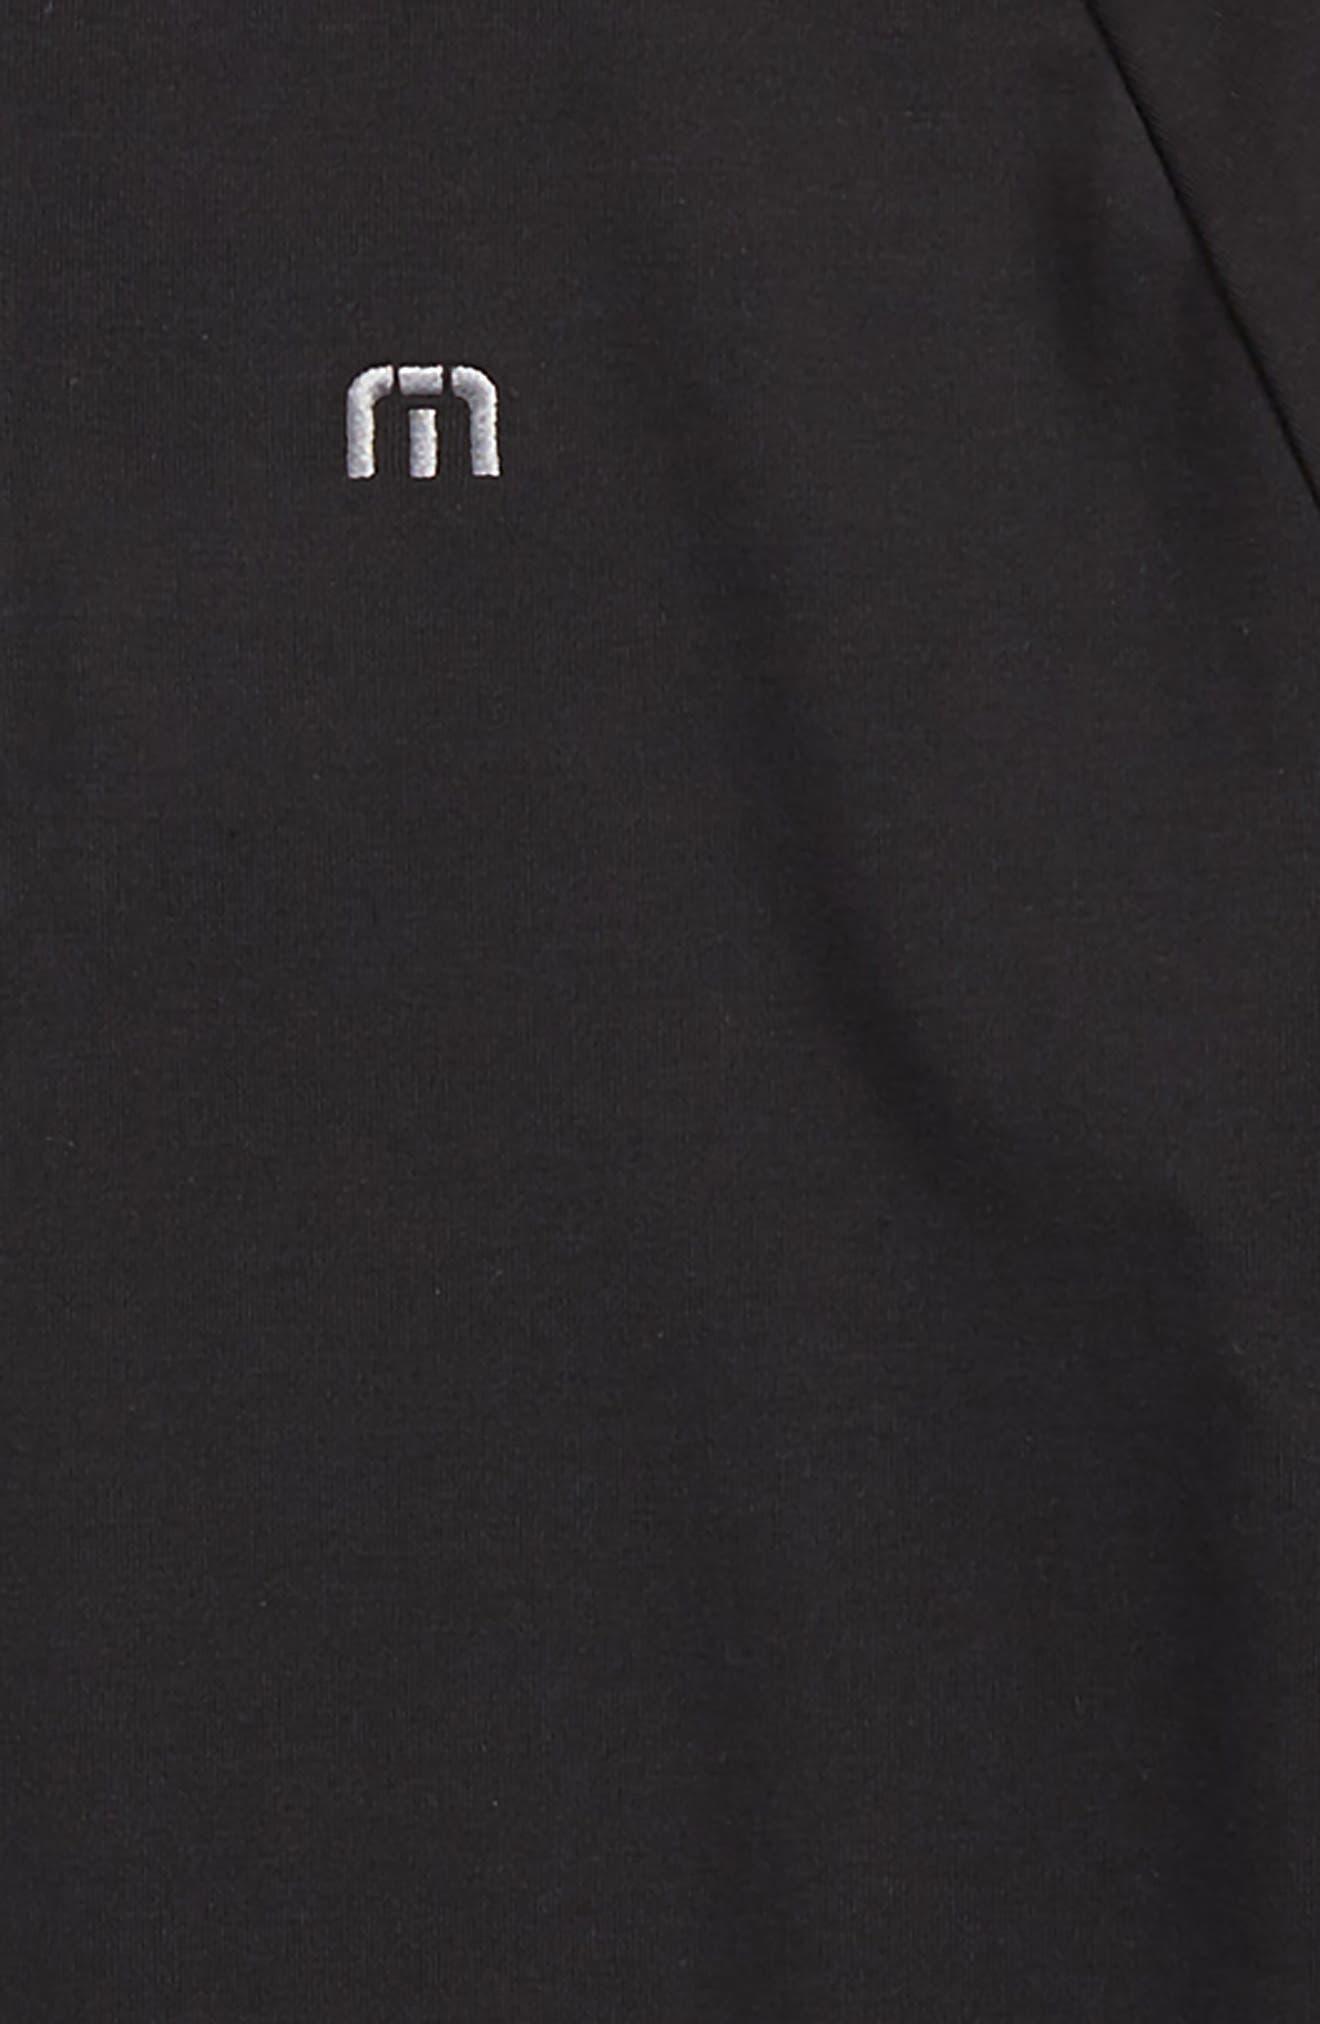 Younglove Quarter Zip Pullover,                             Alternate thumbnail 2, color,                             Black